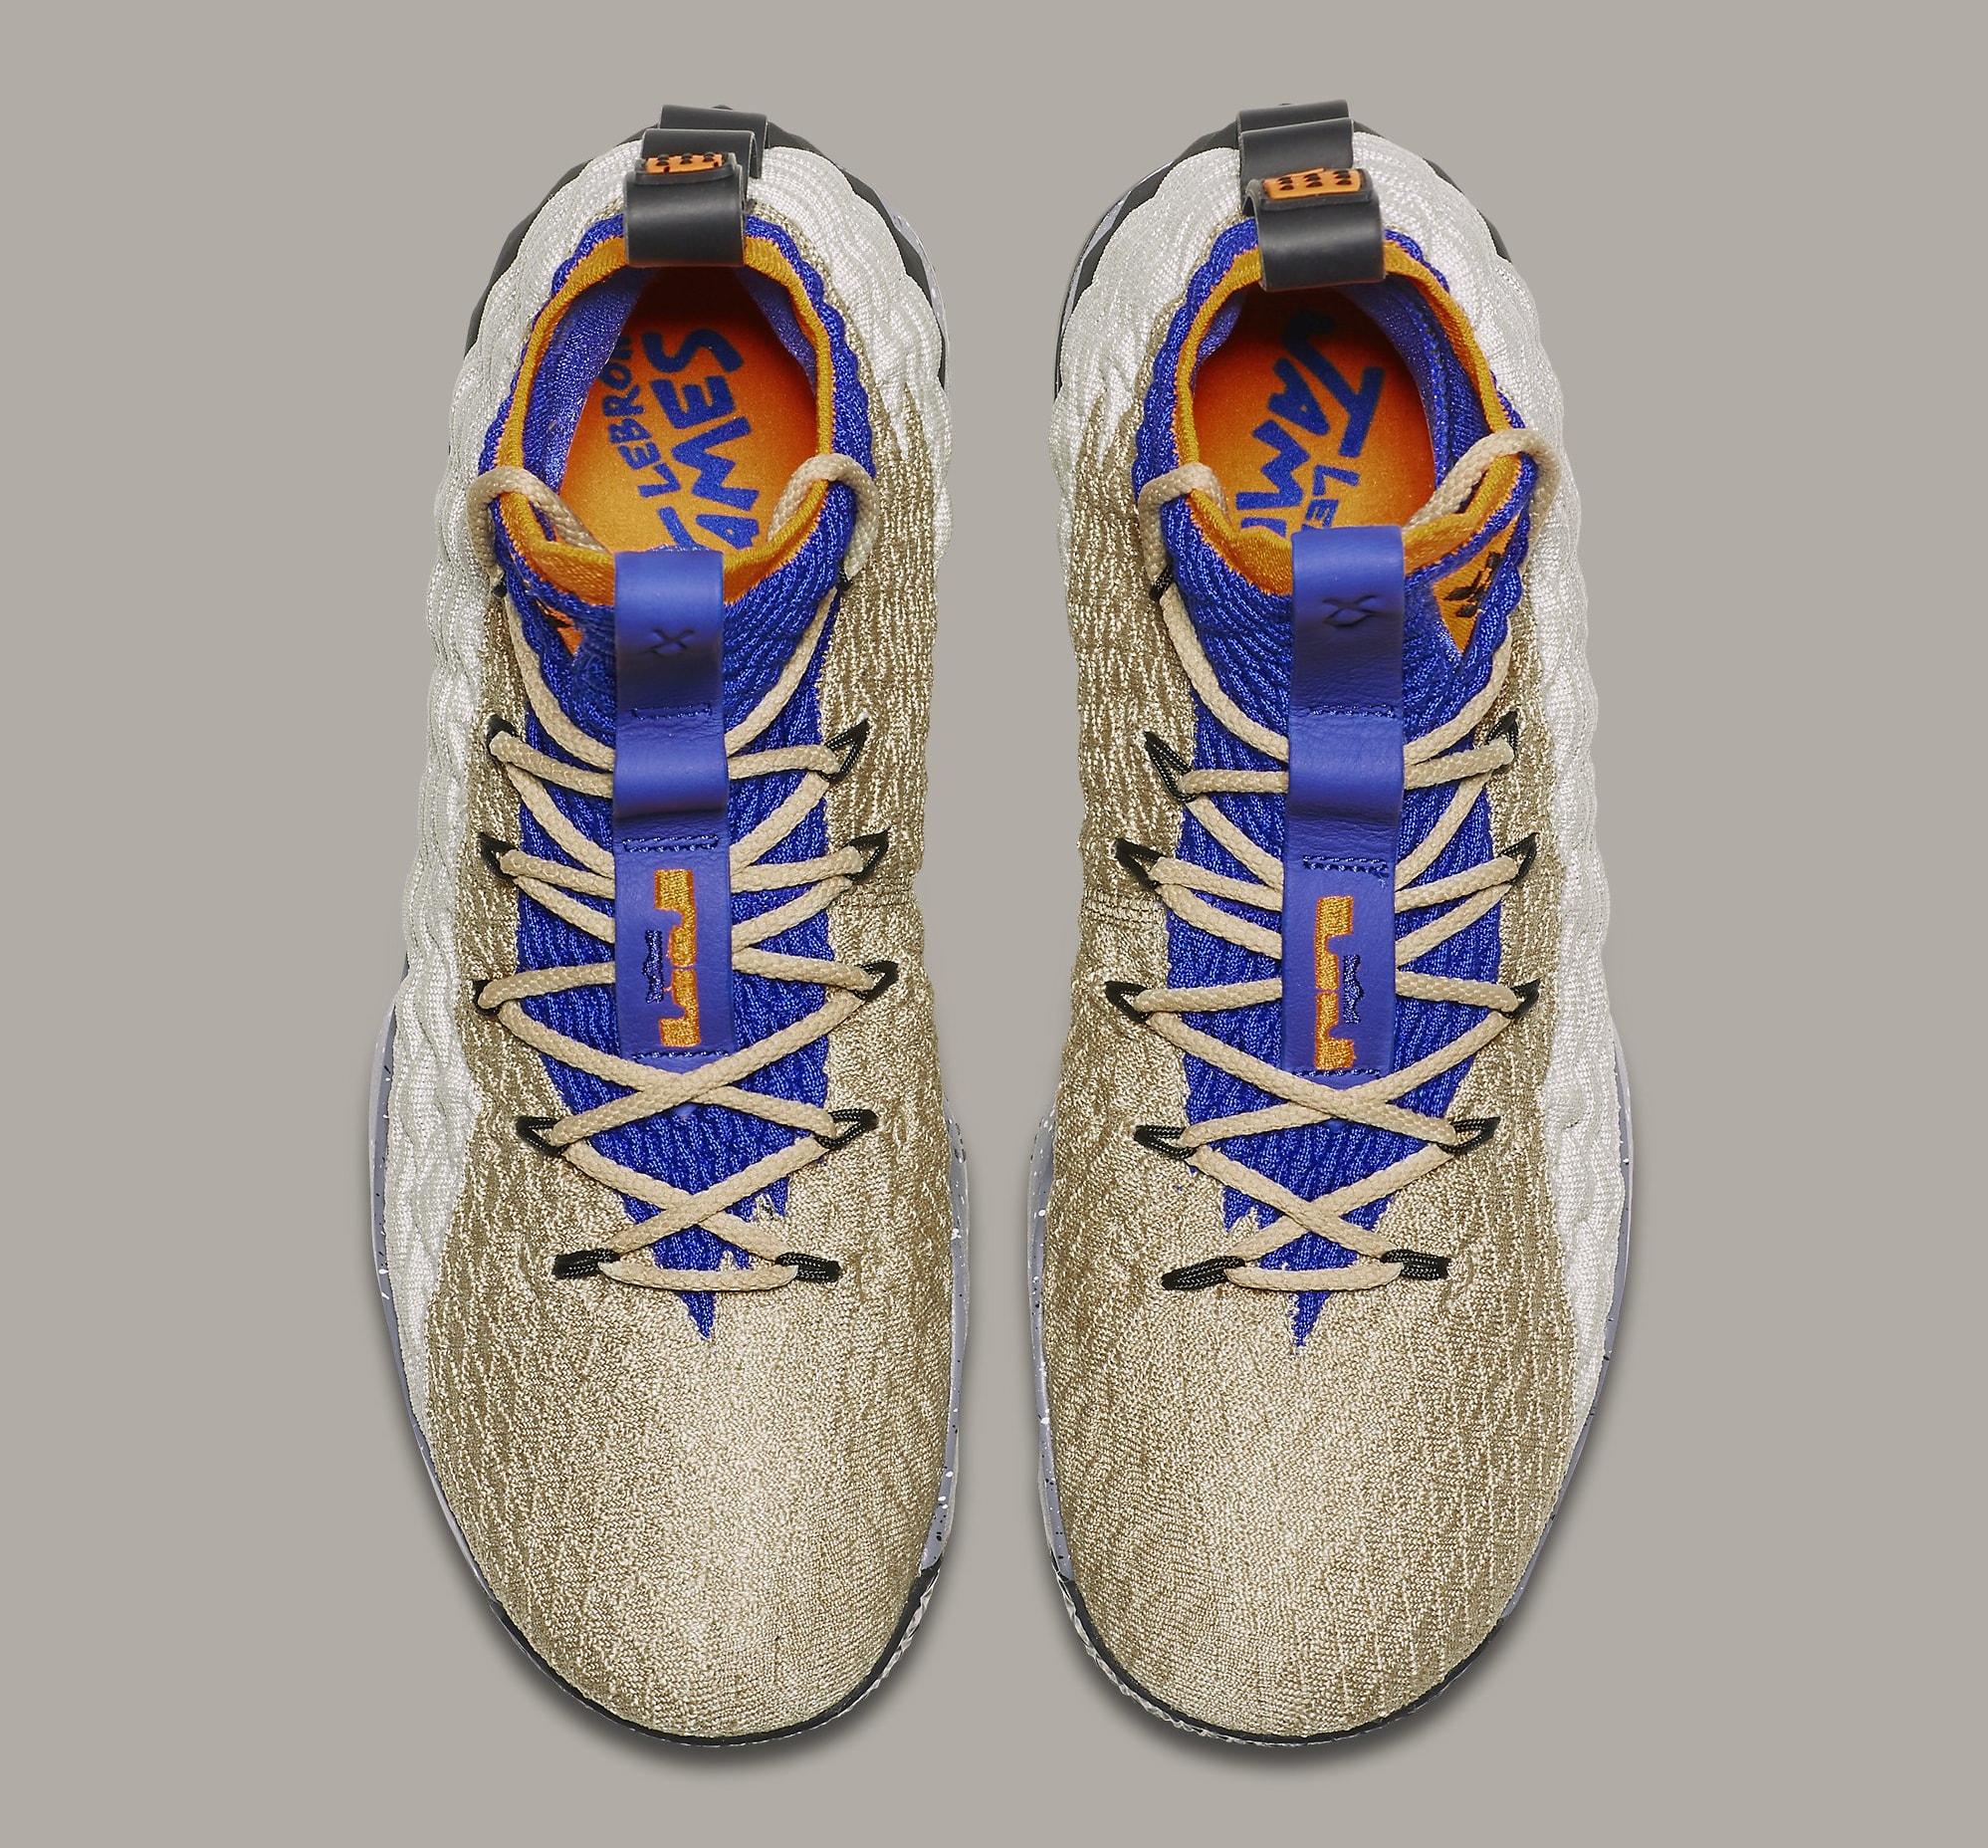 Nike LeBron 15 Mowabb Release Date AR4831-900 Top